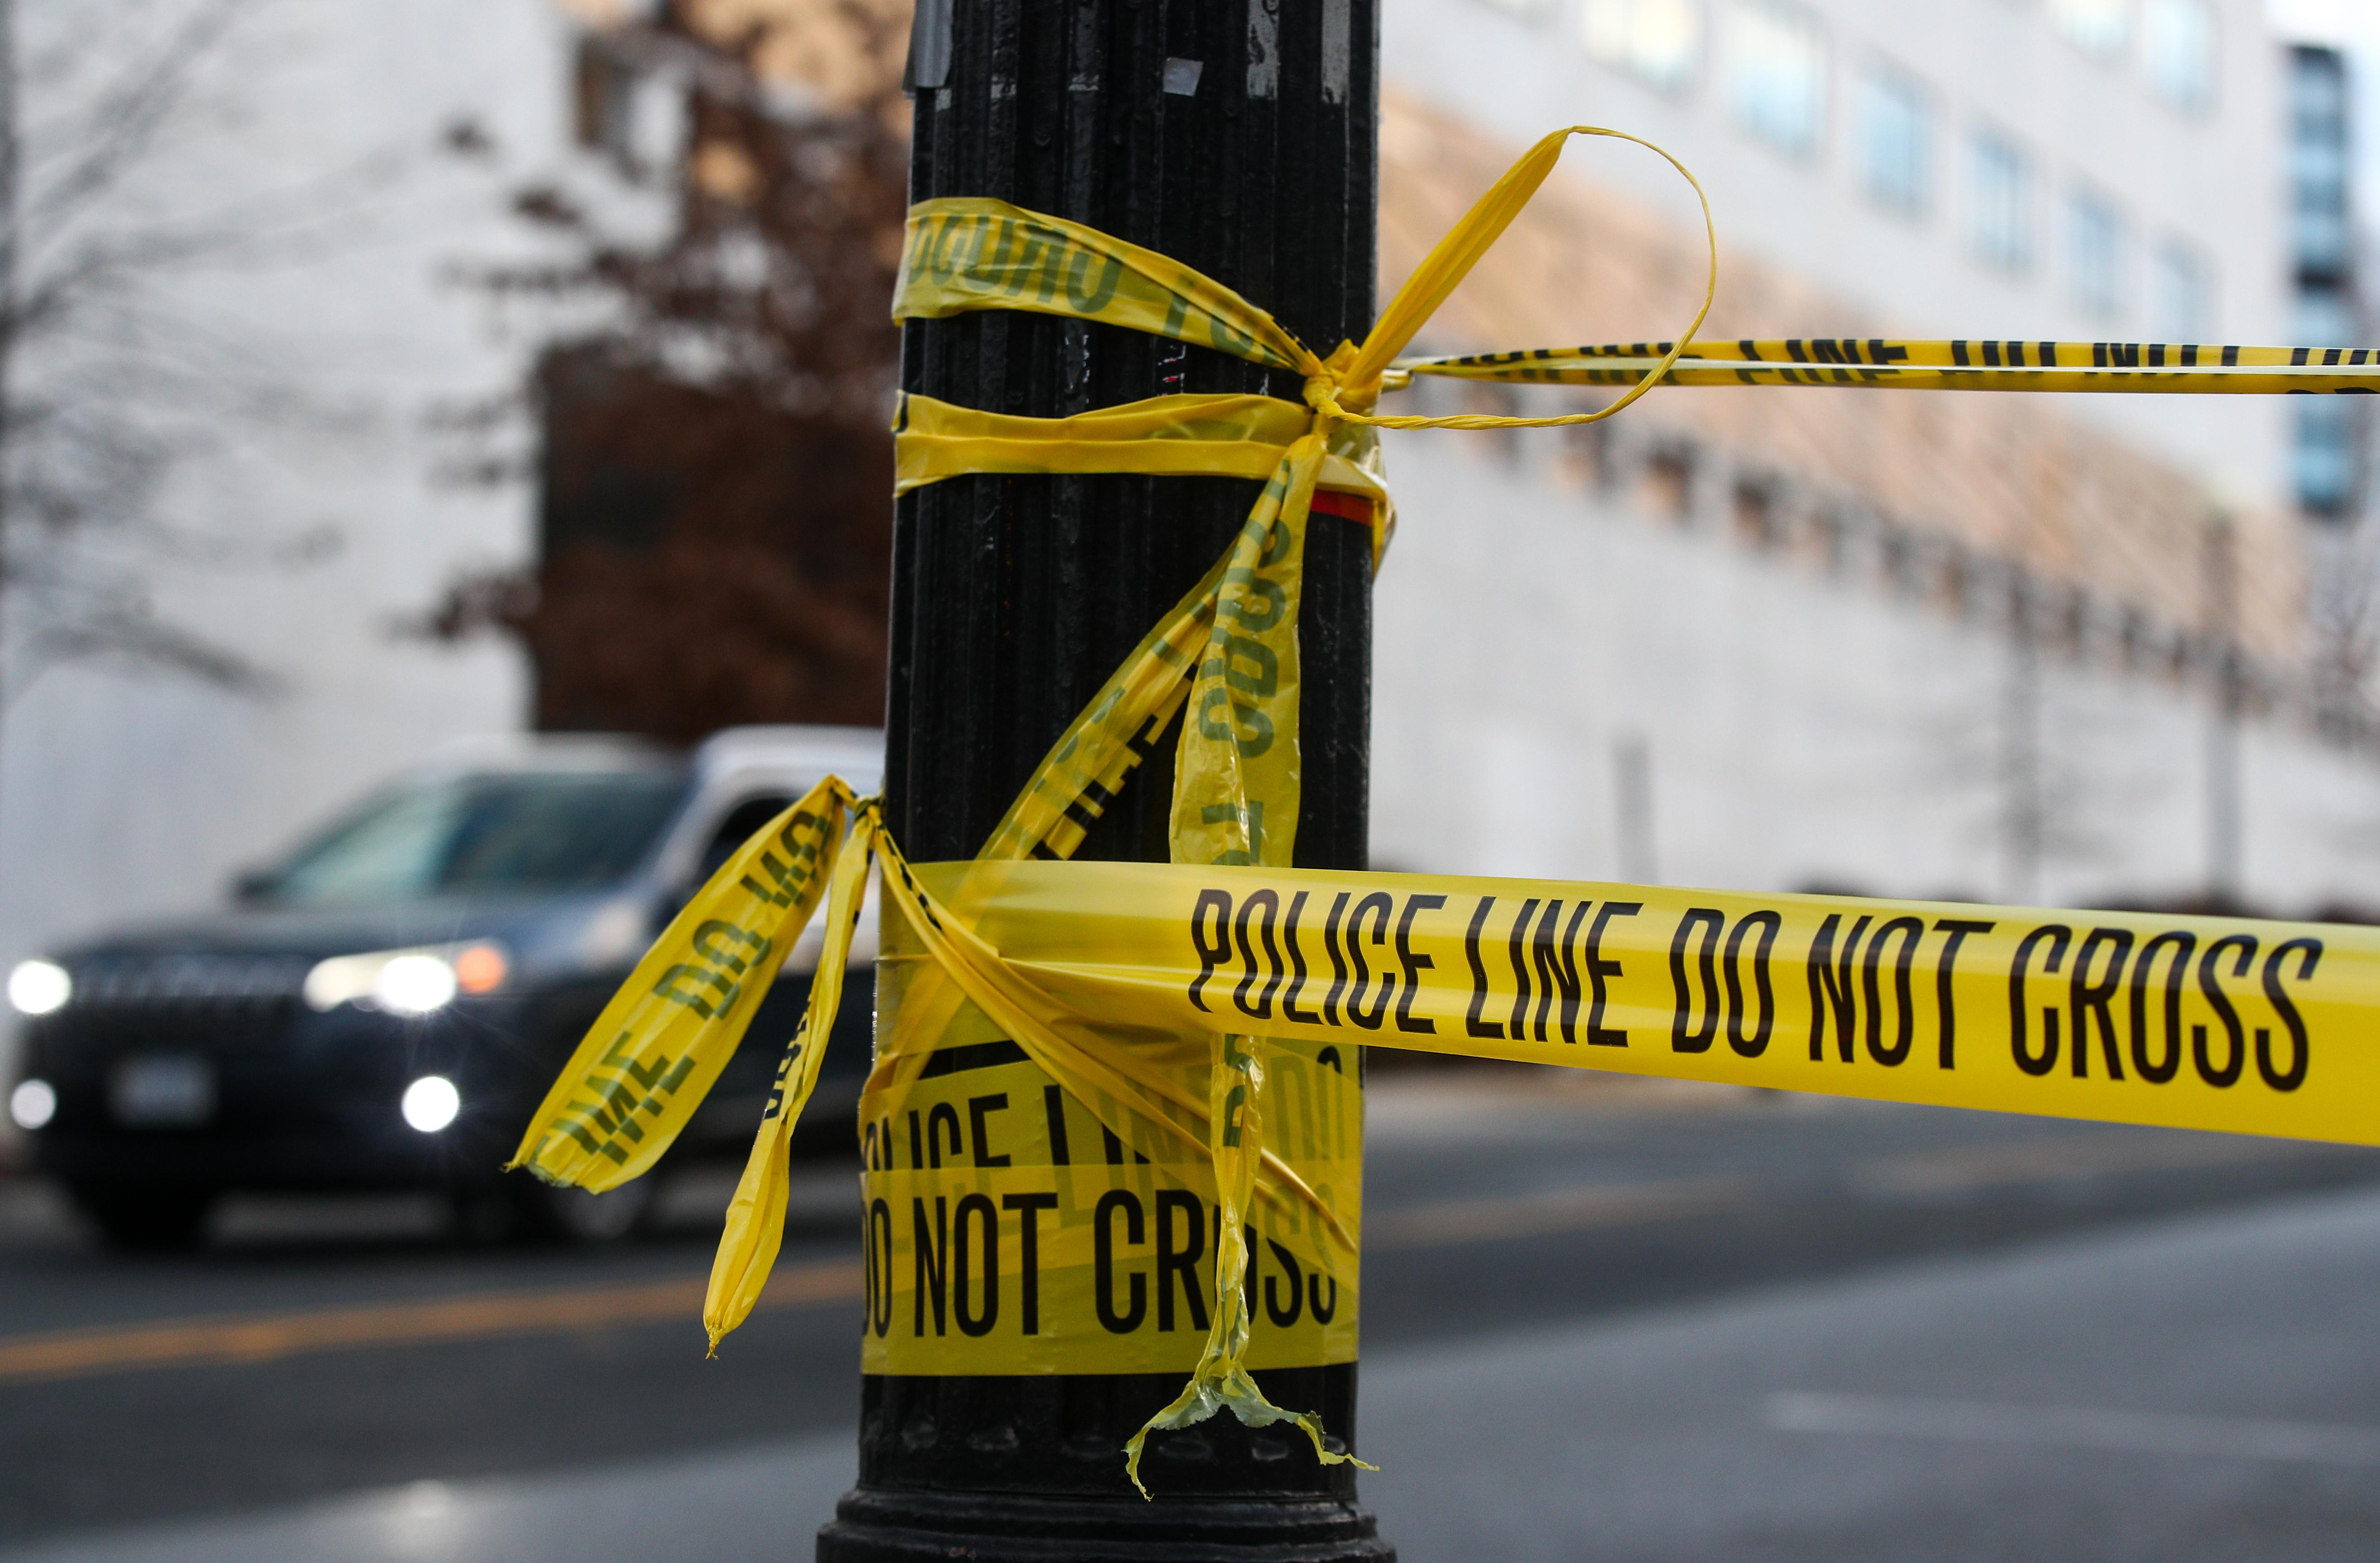 police caution tape